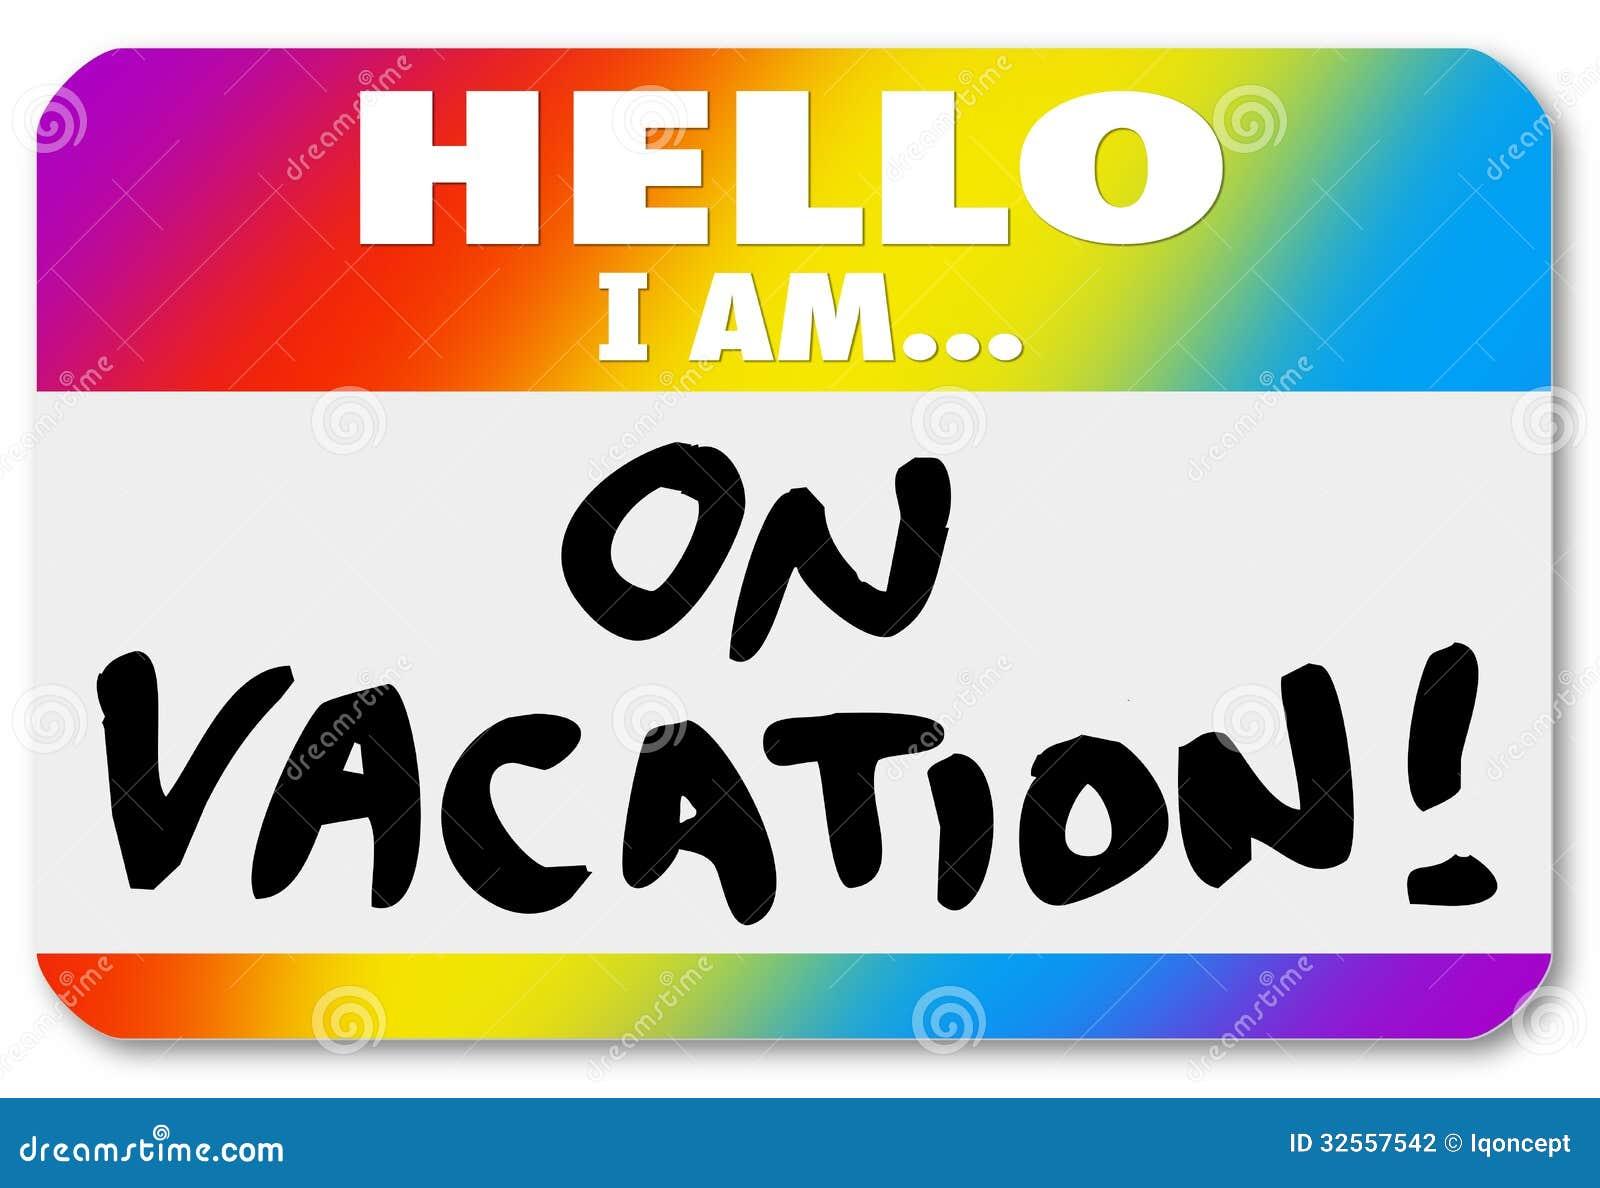 funny vacation clipart - photo #11